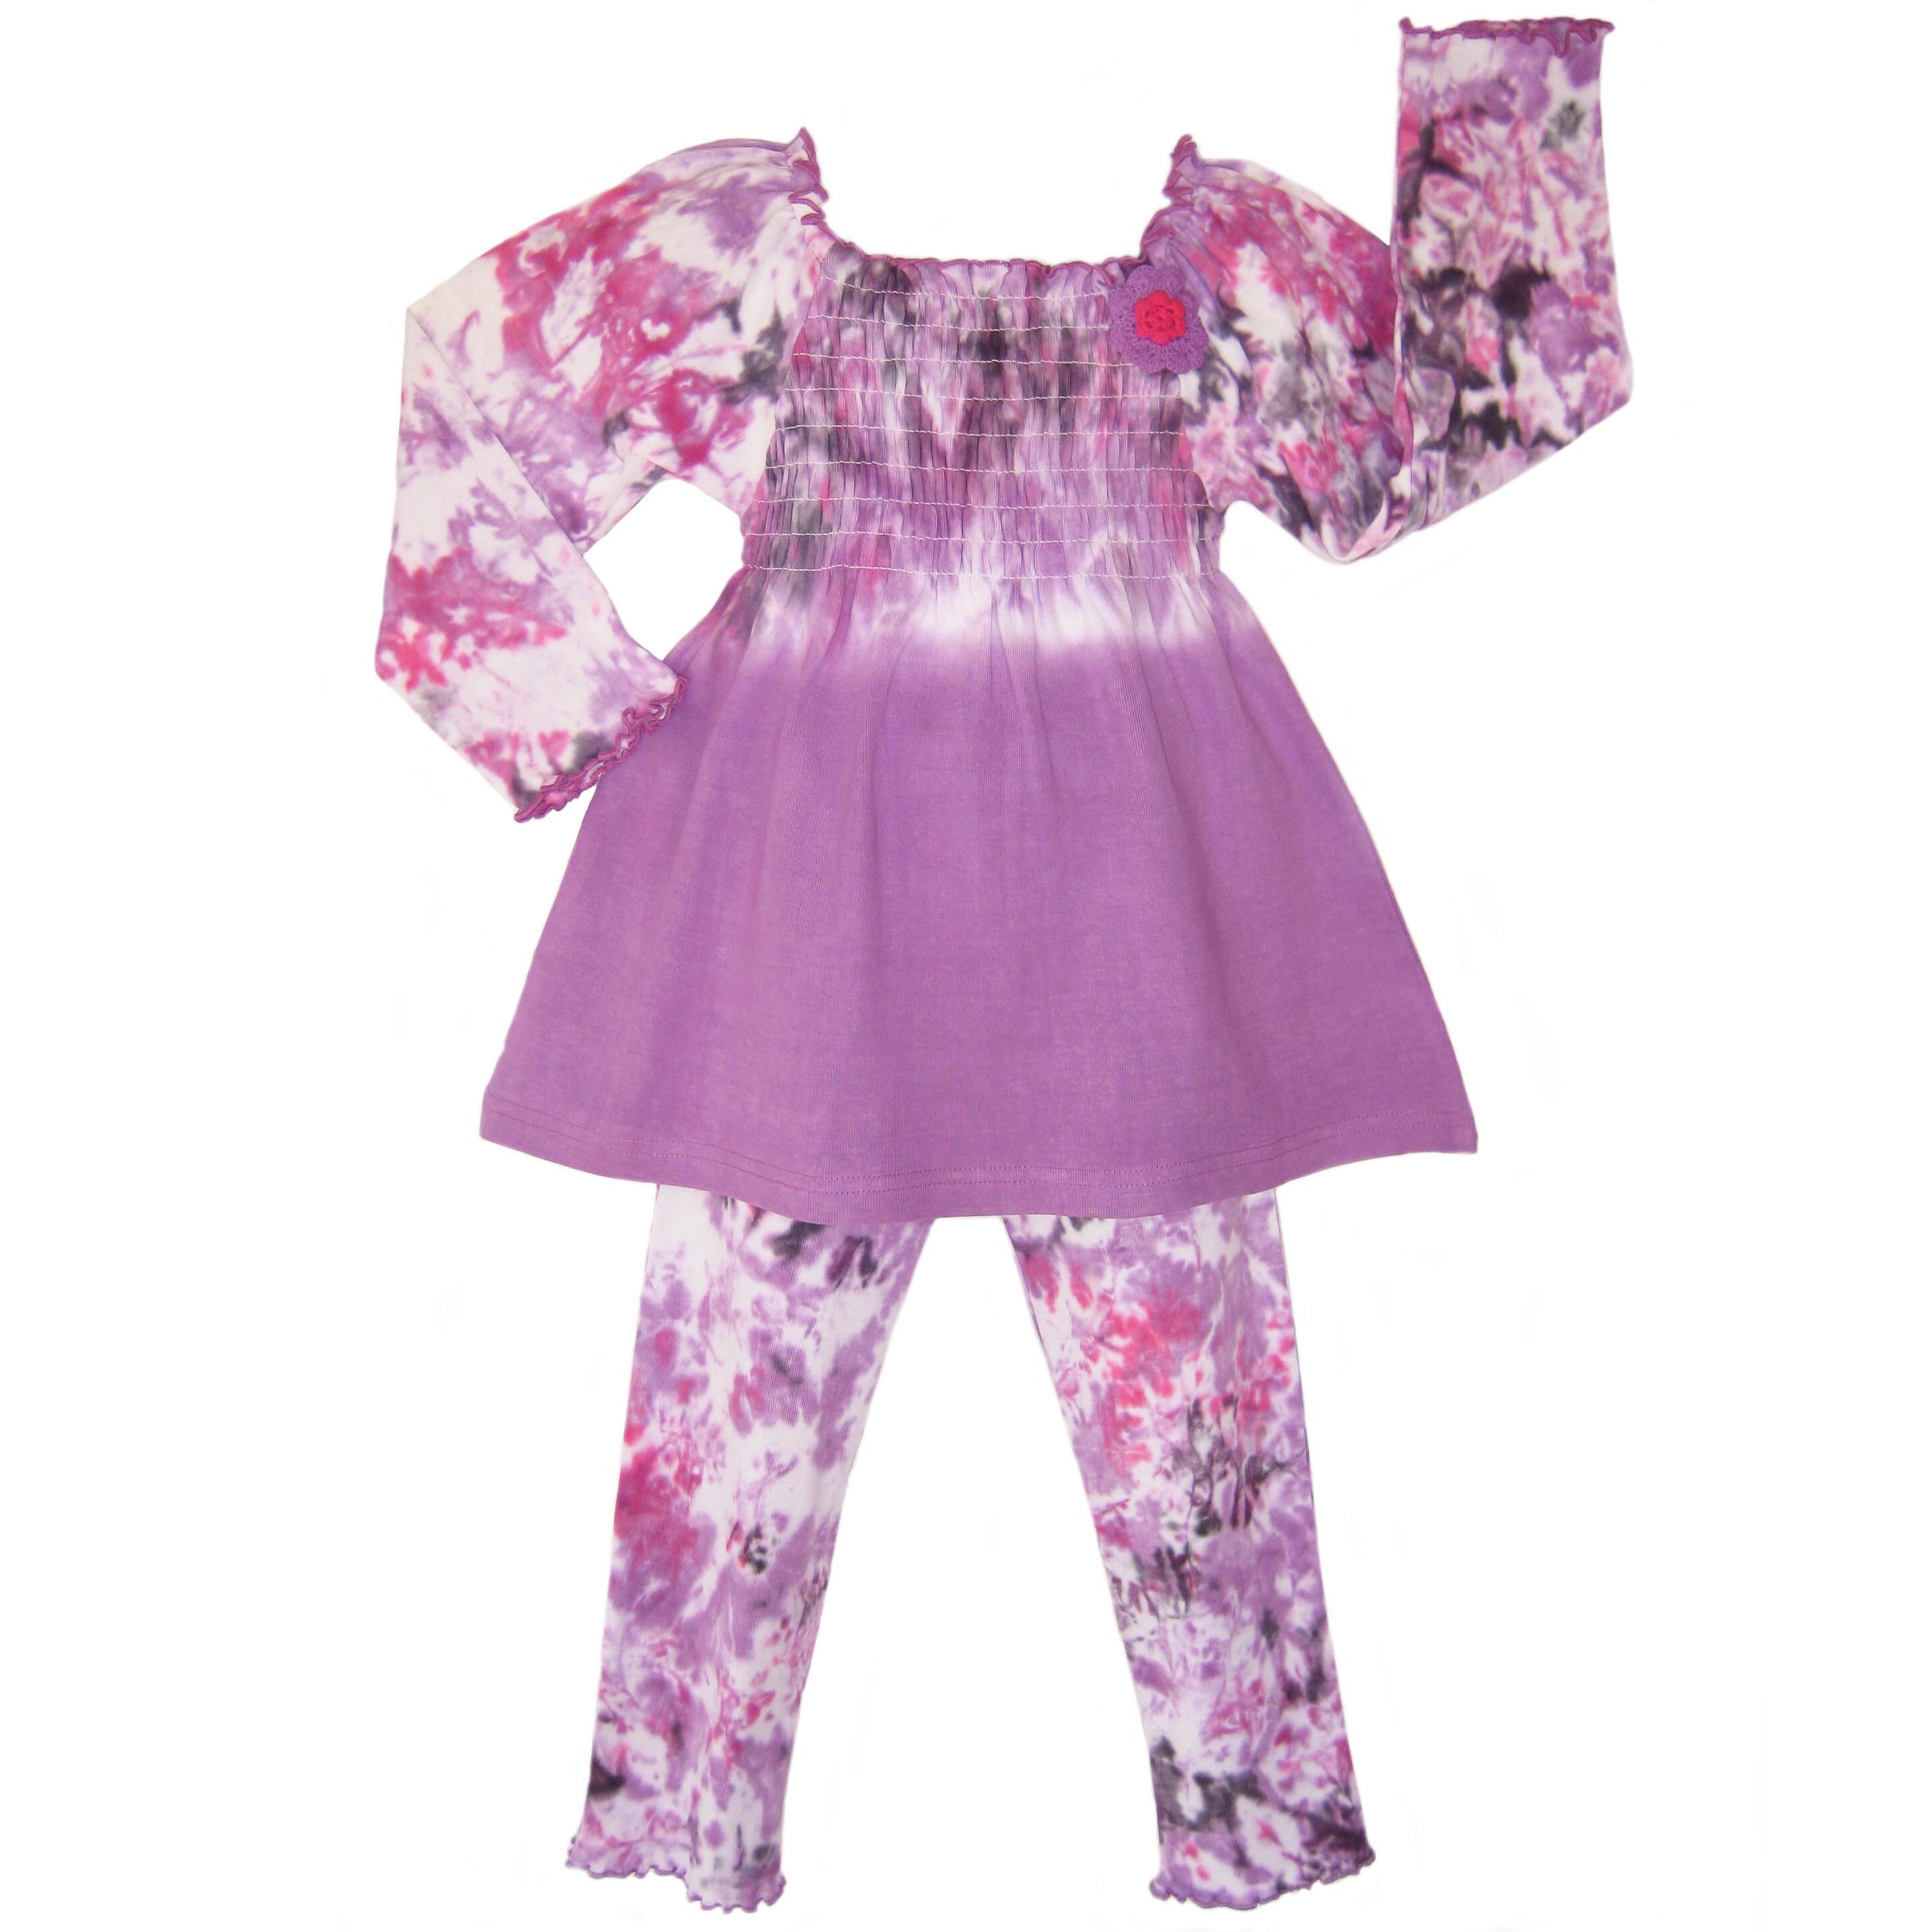 Ann Loren Girl's Purple Tie-dye 2-piece Set